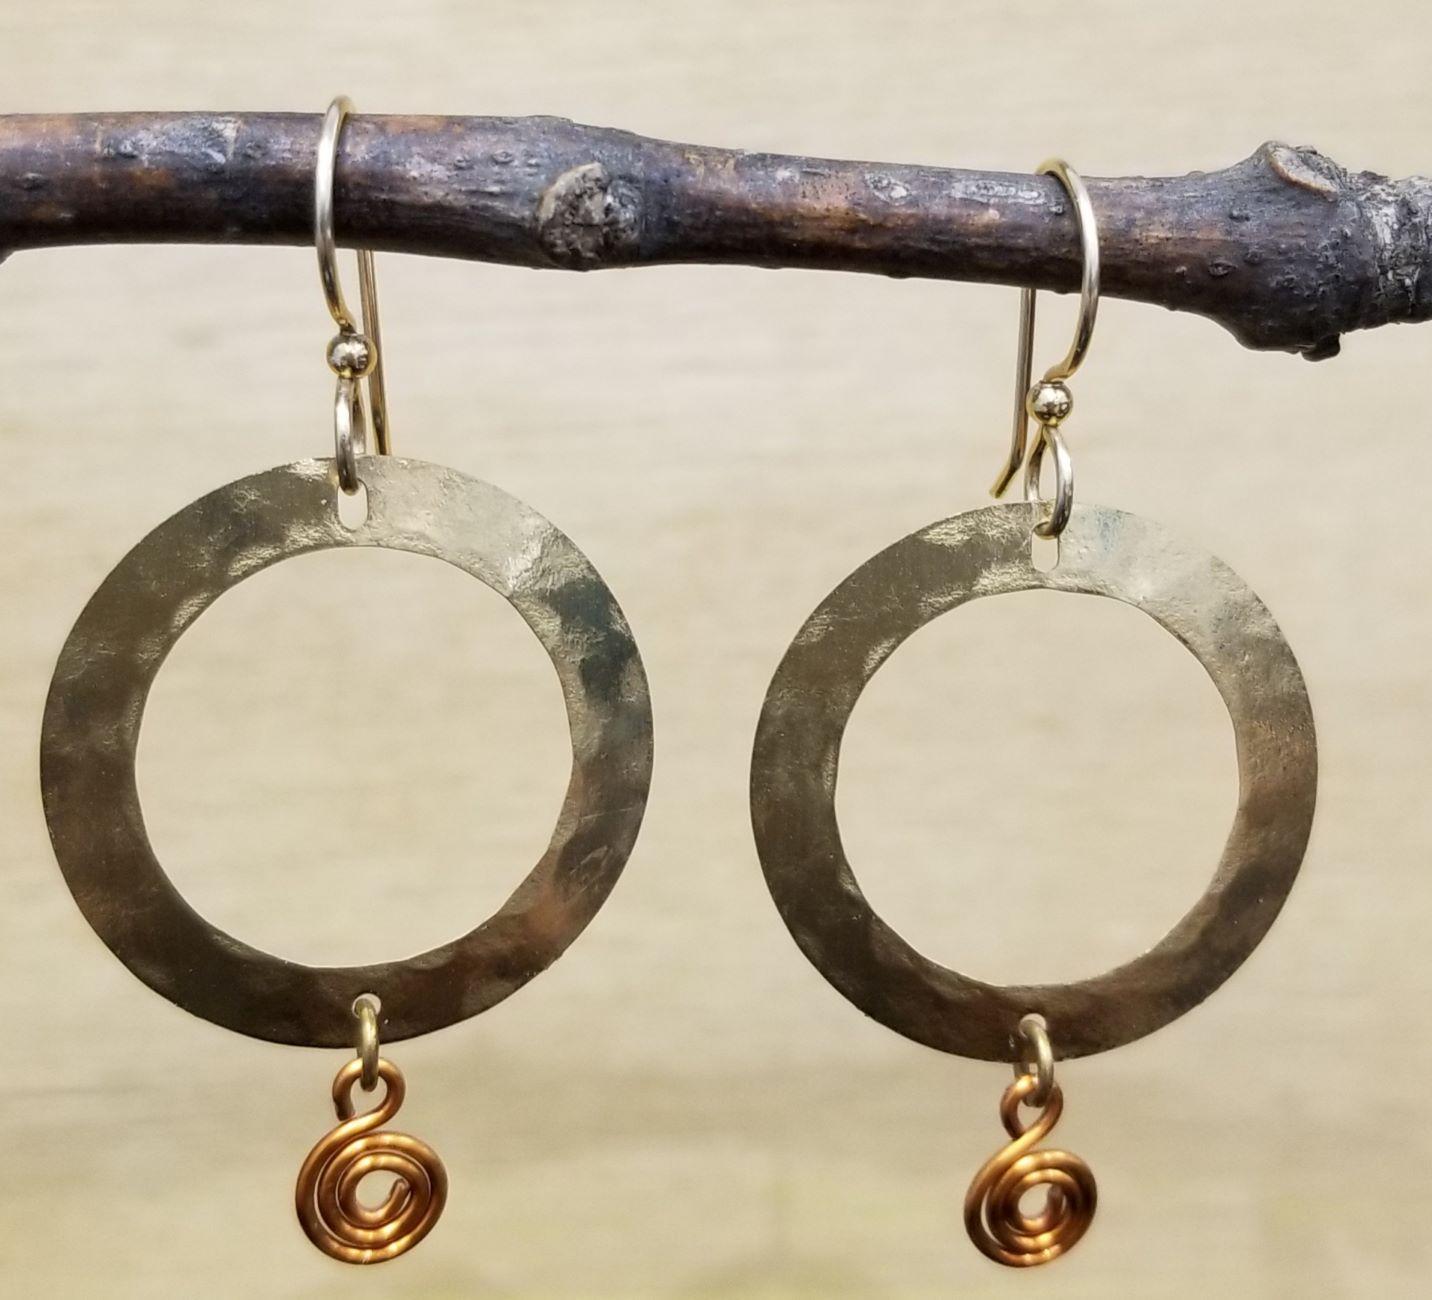 gold-tone earrings with copper swirls by Joseph Brinton